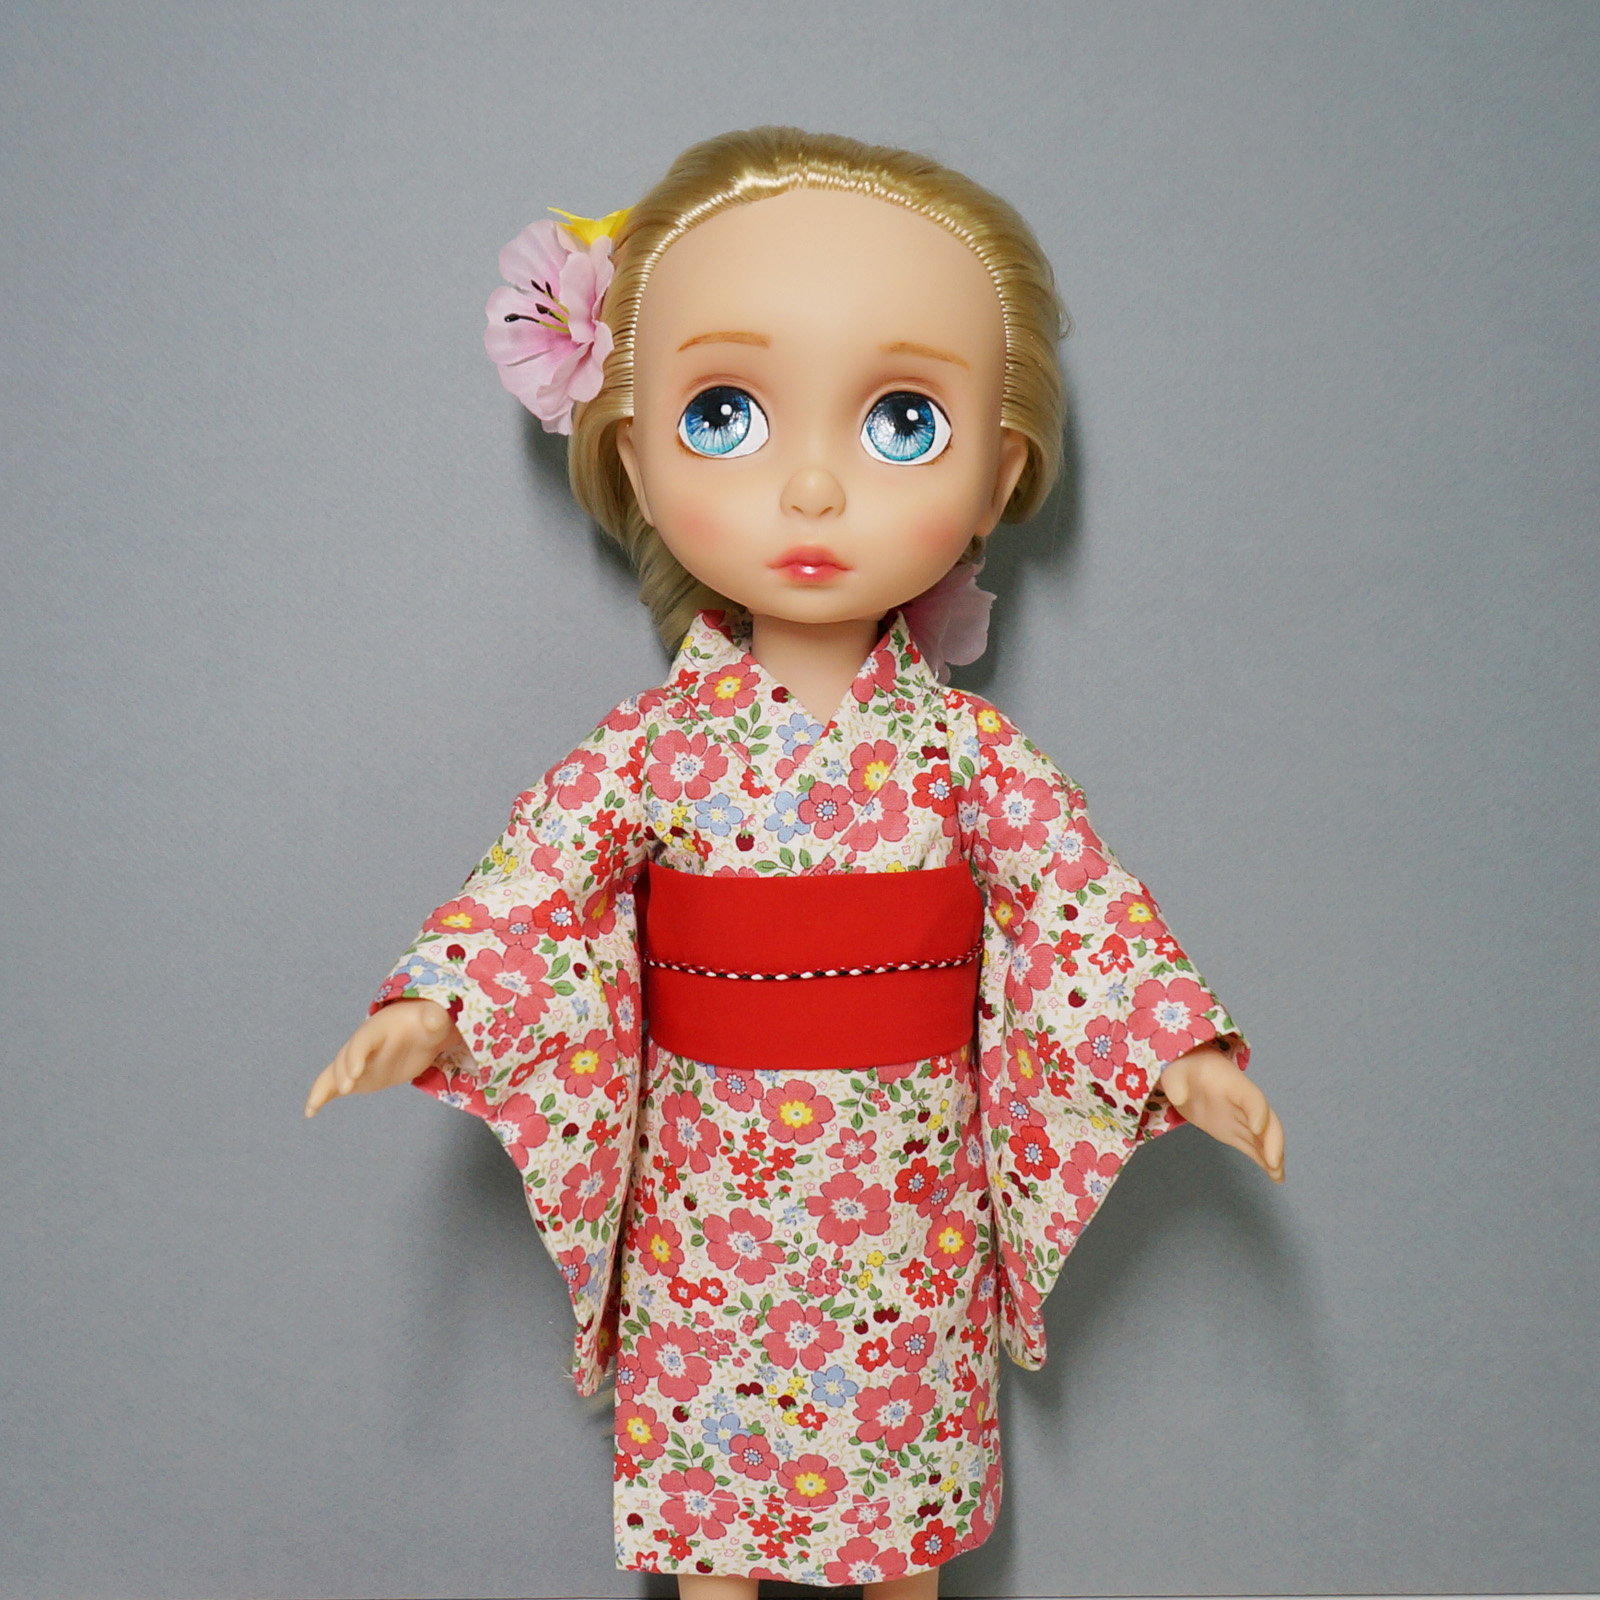 Disney Princess Toddler Doll With Dress: Disney Baby Doll Clothes Yukata Flower Dress Clothing